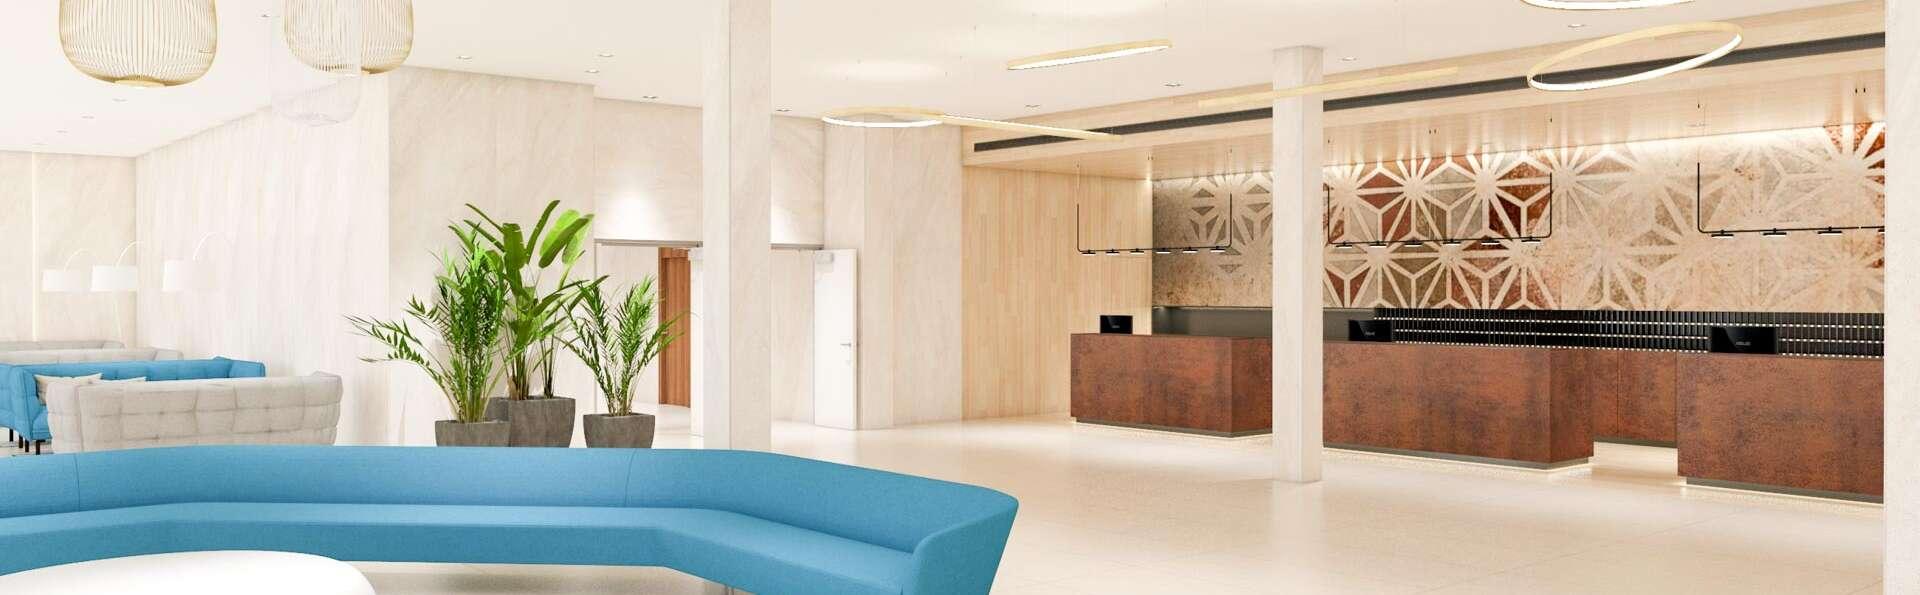 Hotel l'Azure - EDIT_LOBBY_01.jpg